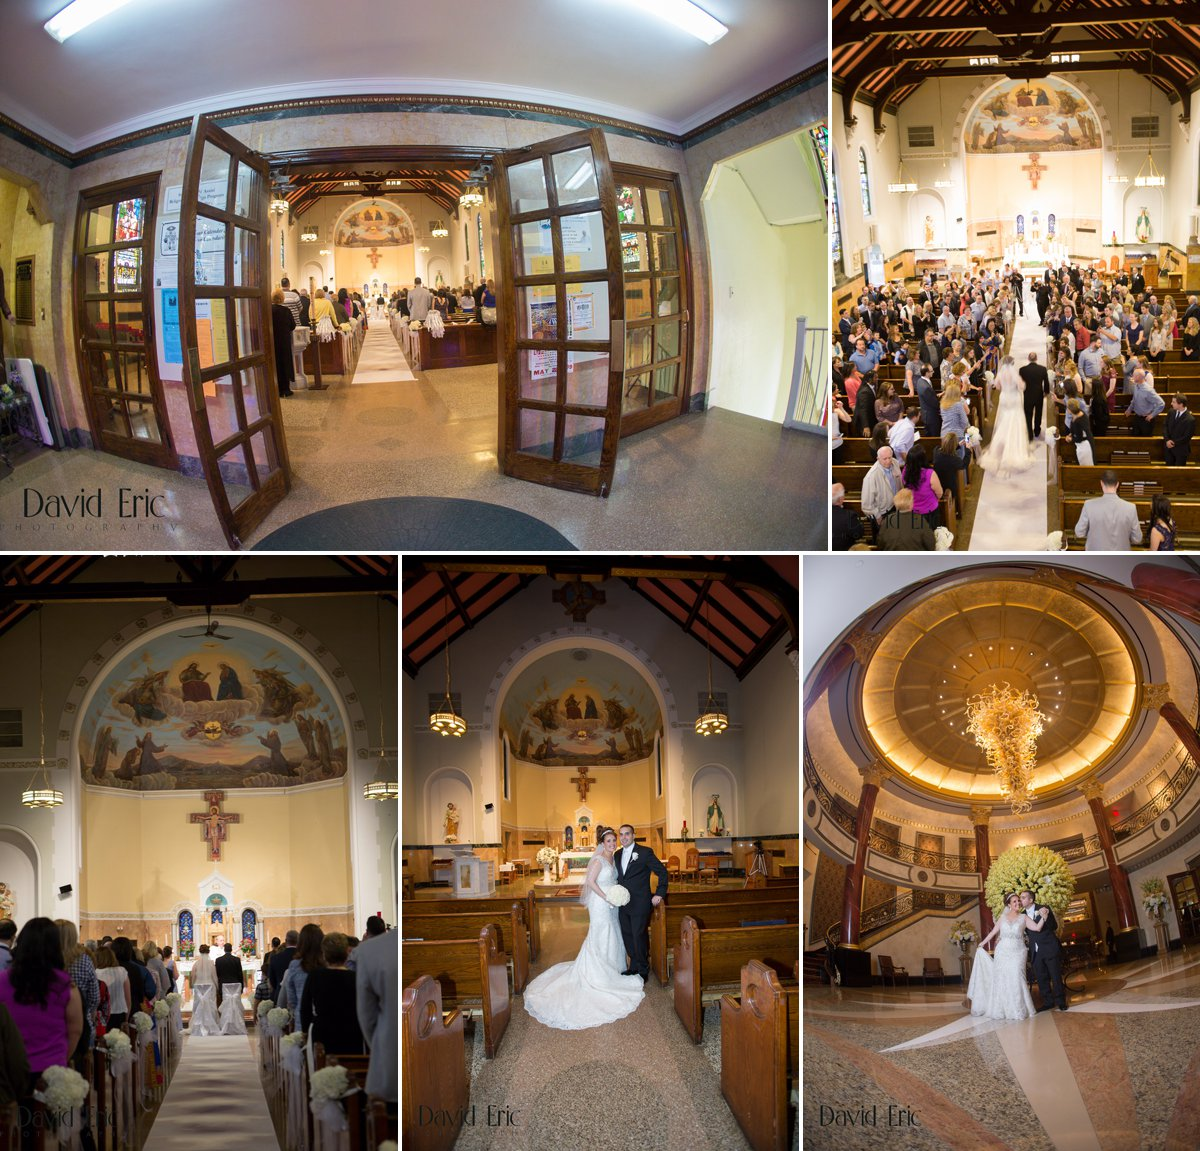 David Eric - Brugger Wedding 2